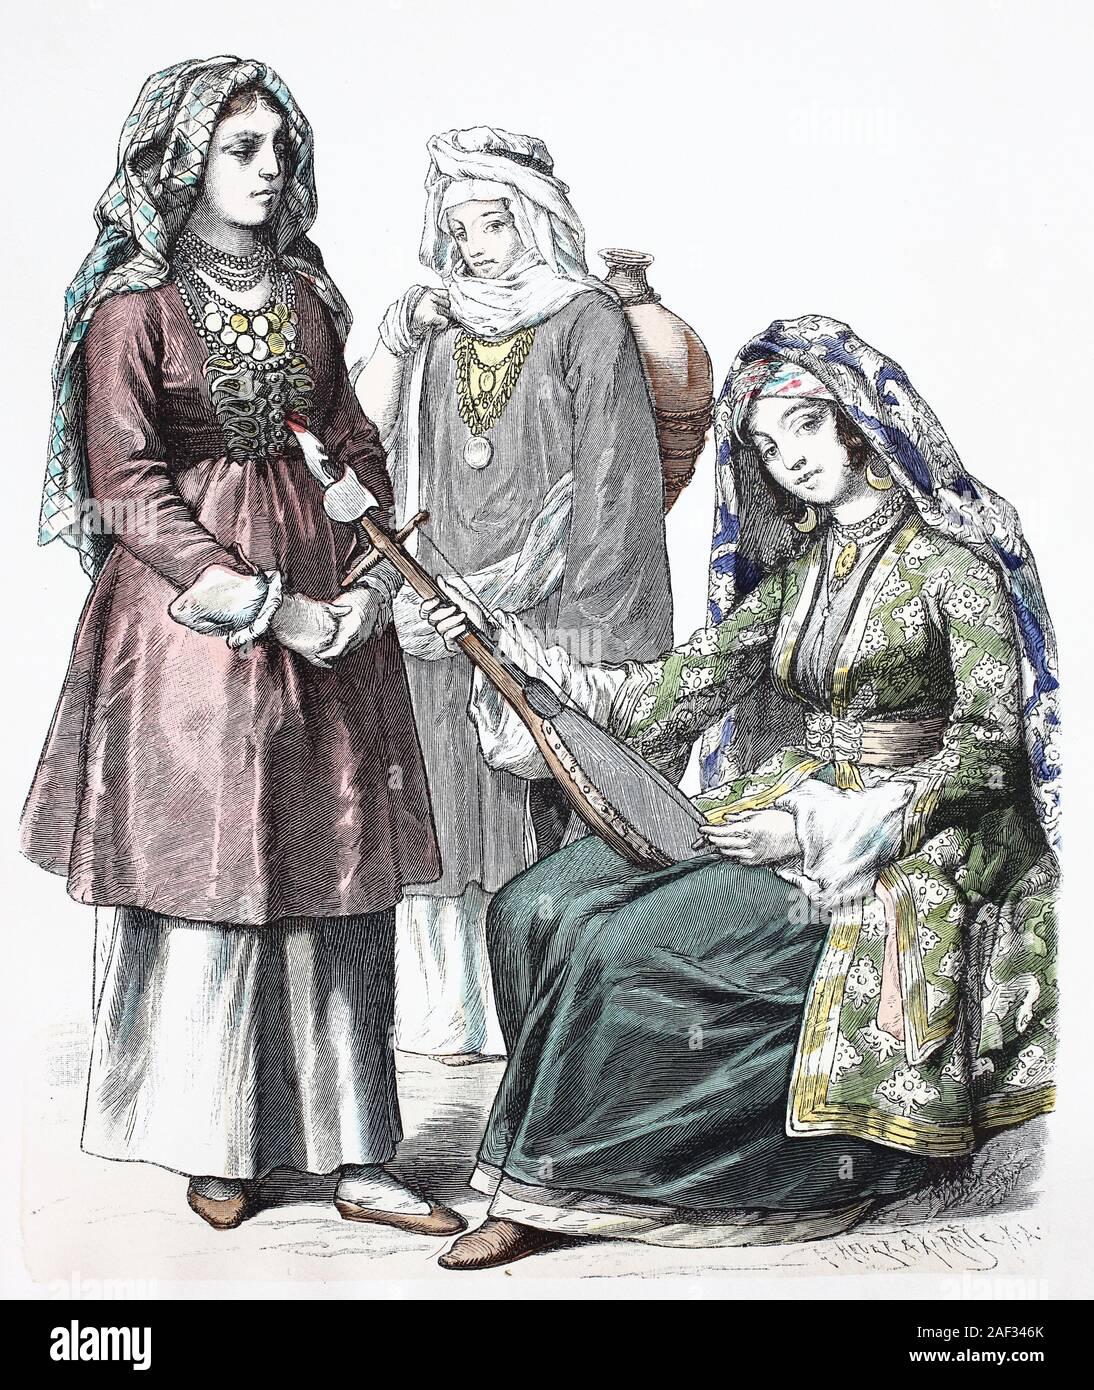 Dagestan girls